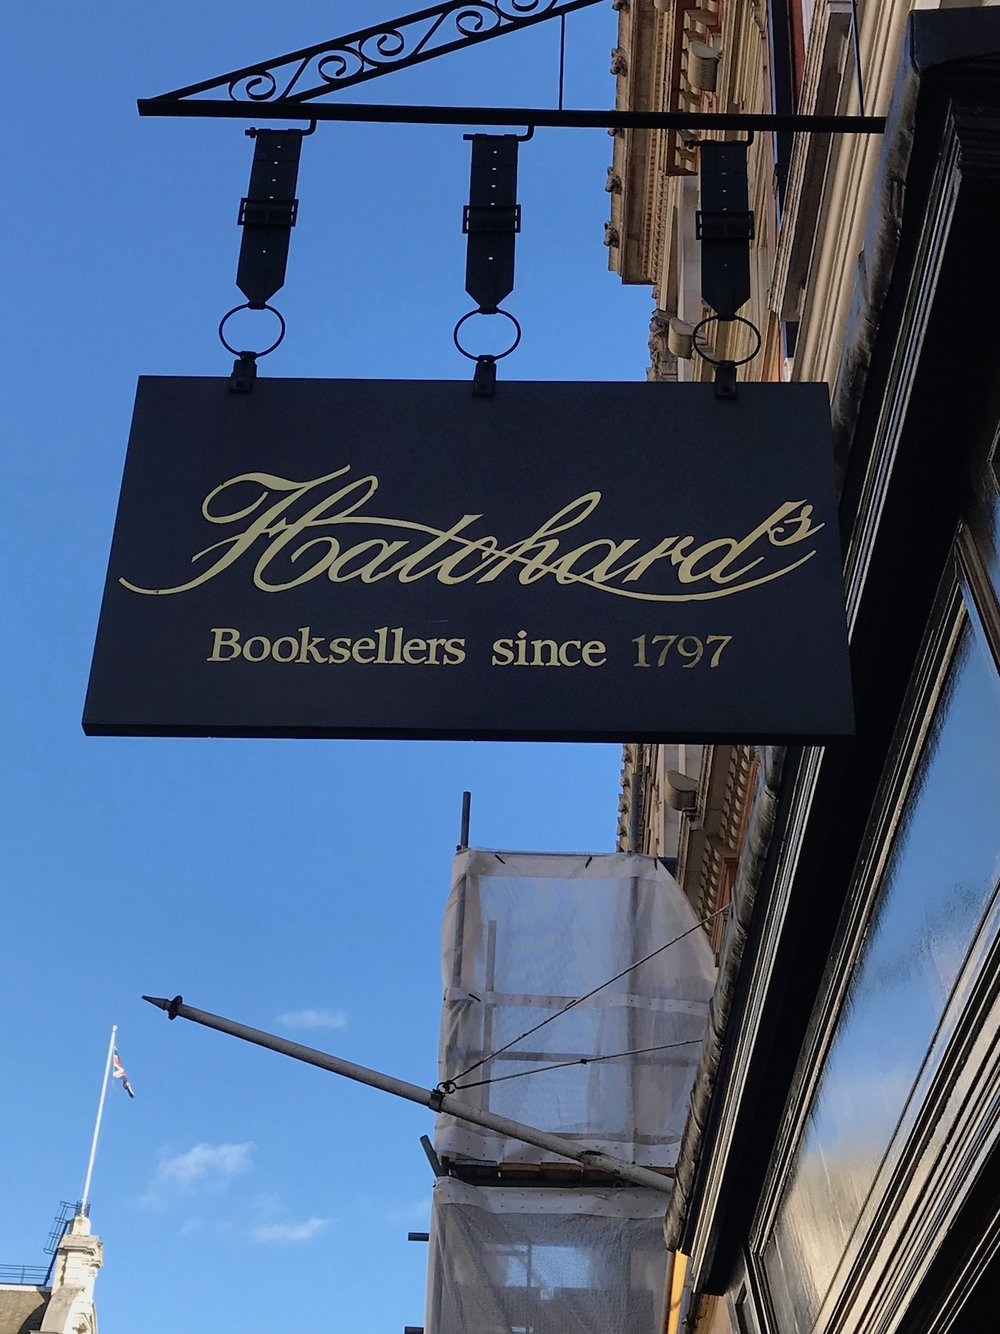 Hatchard's London's Book Store